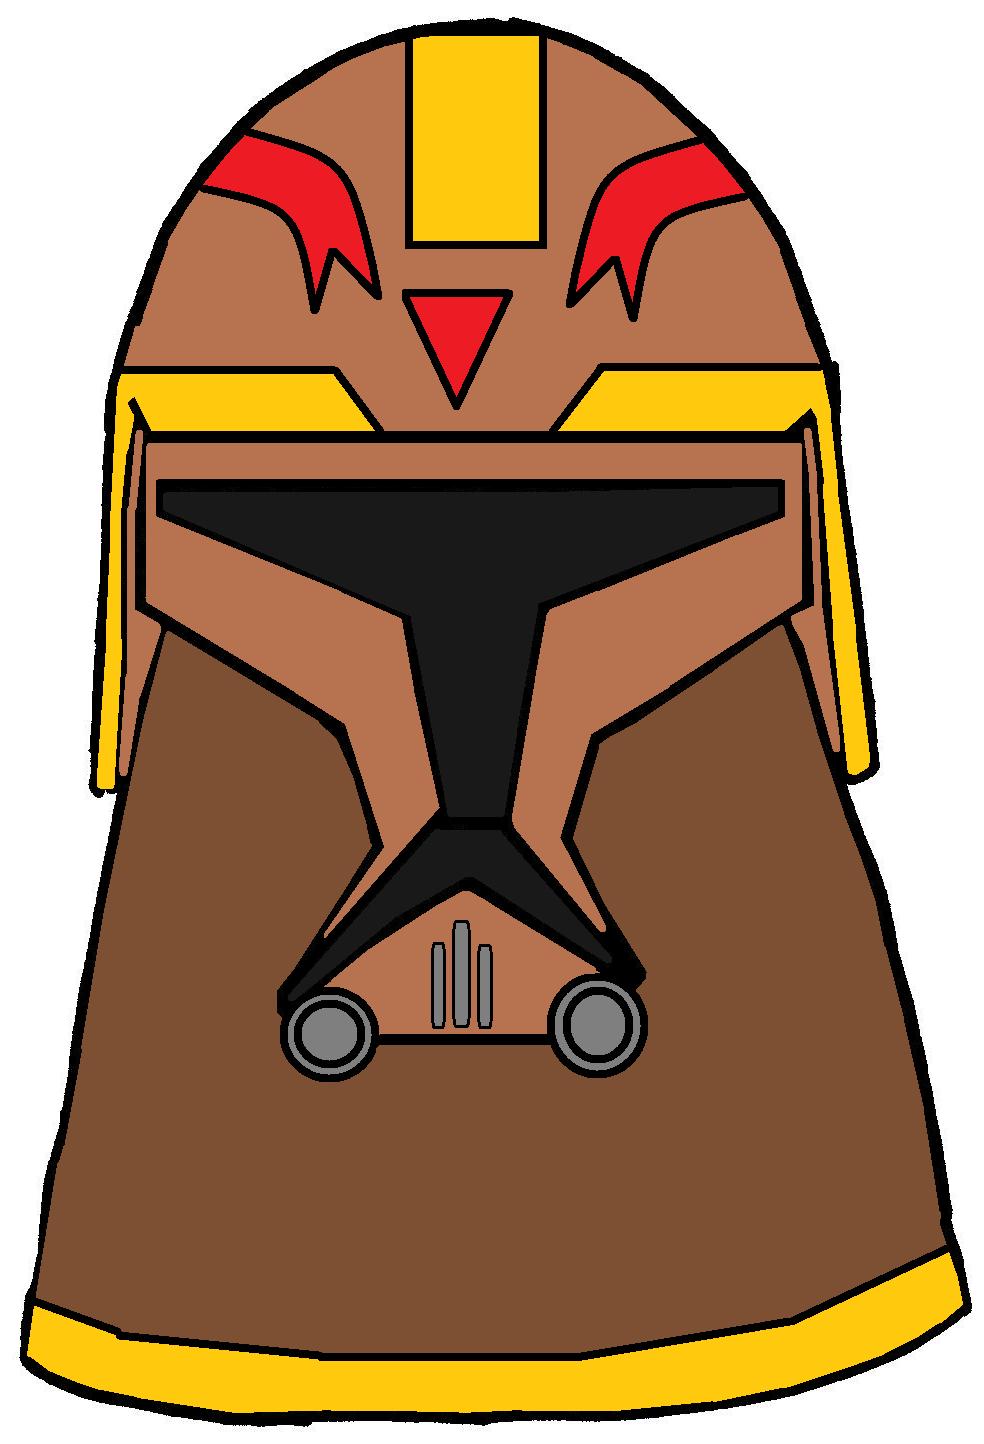 clone commander cody u0027s helmet 1 clone wars tv show helmets